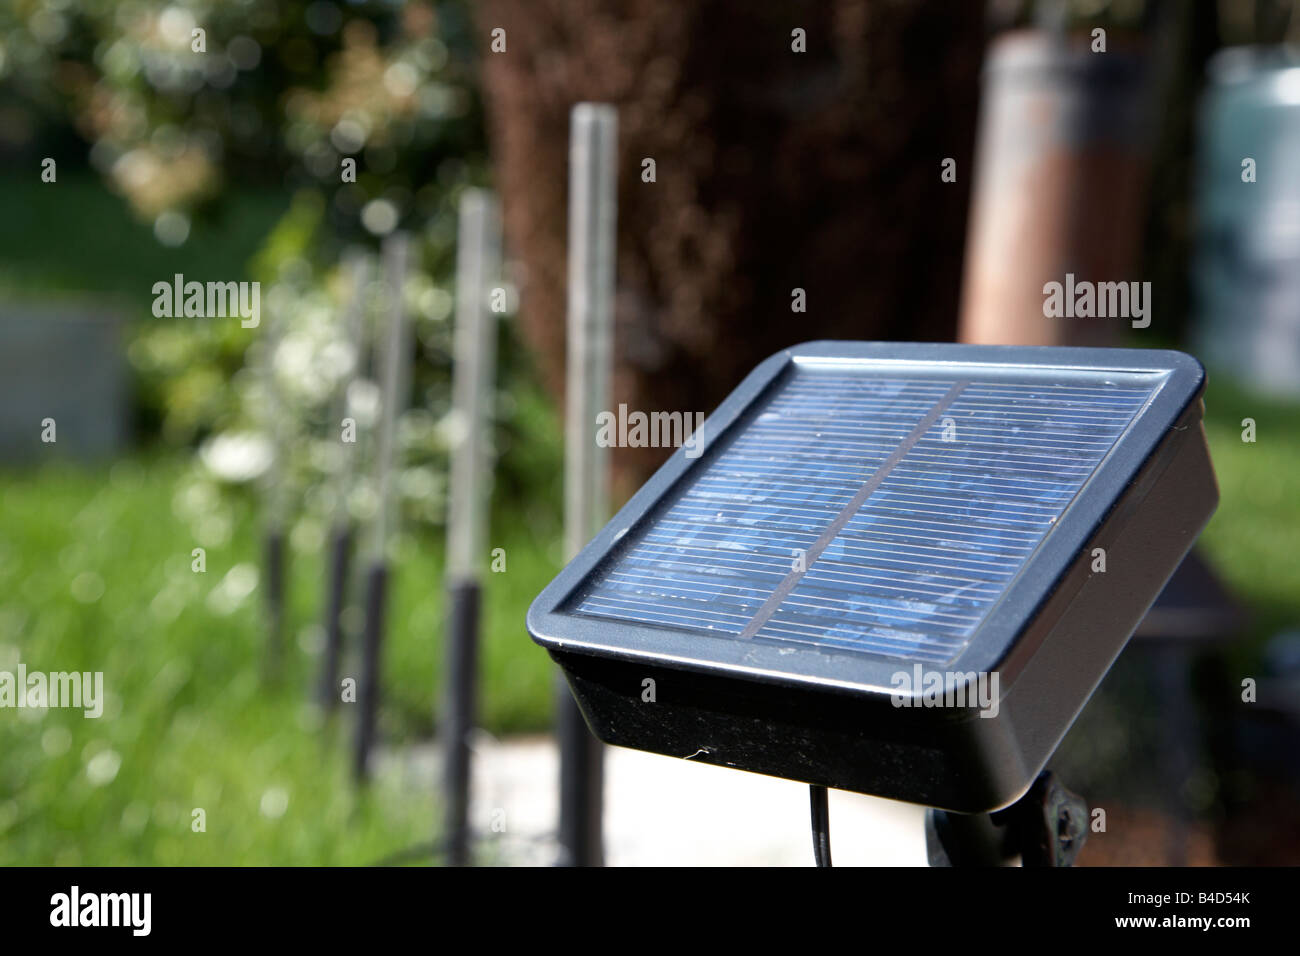 solar garden lighting being used to light pathway in garden in the uk - Stock Image